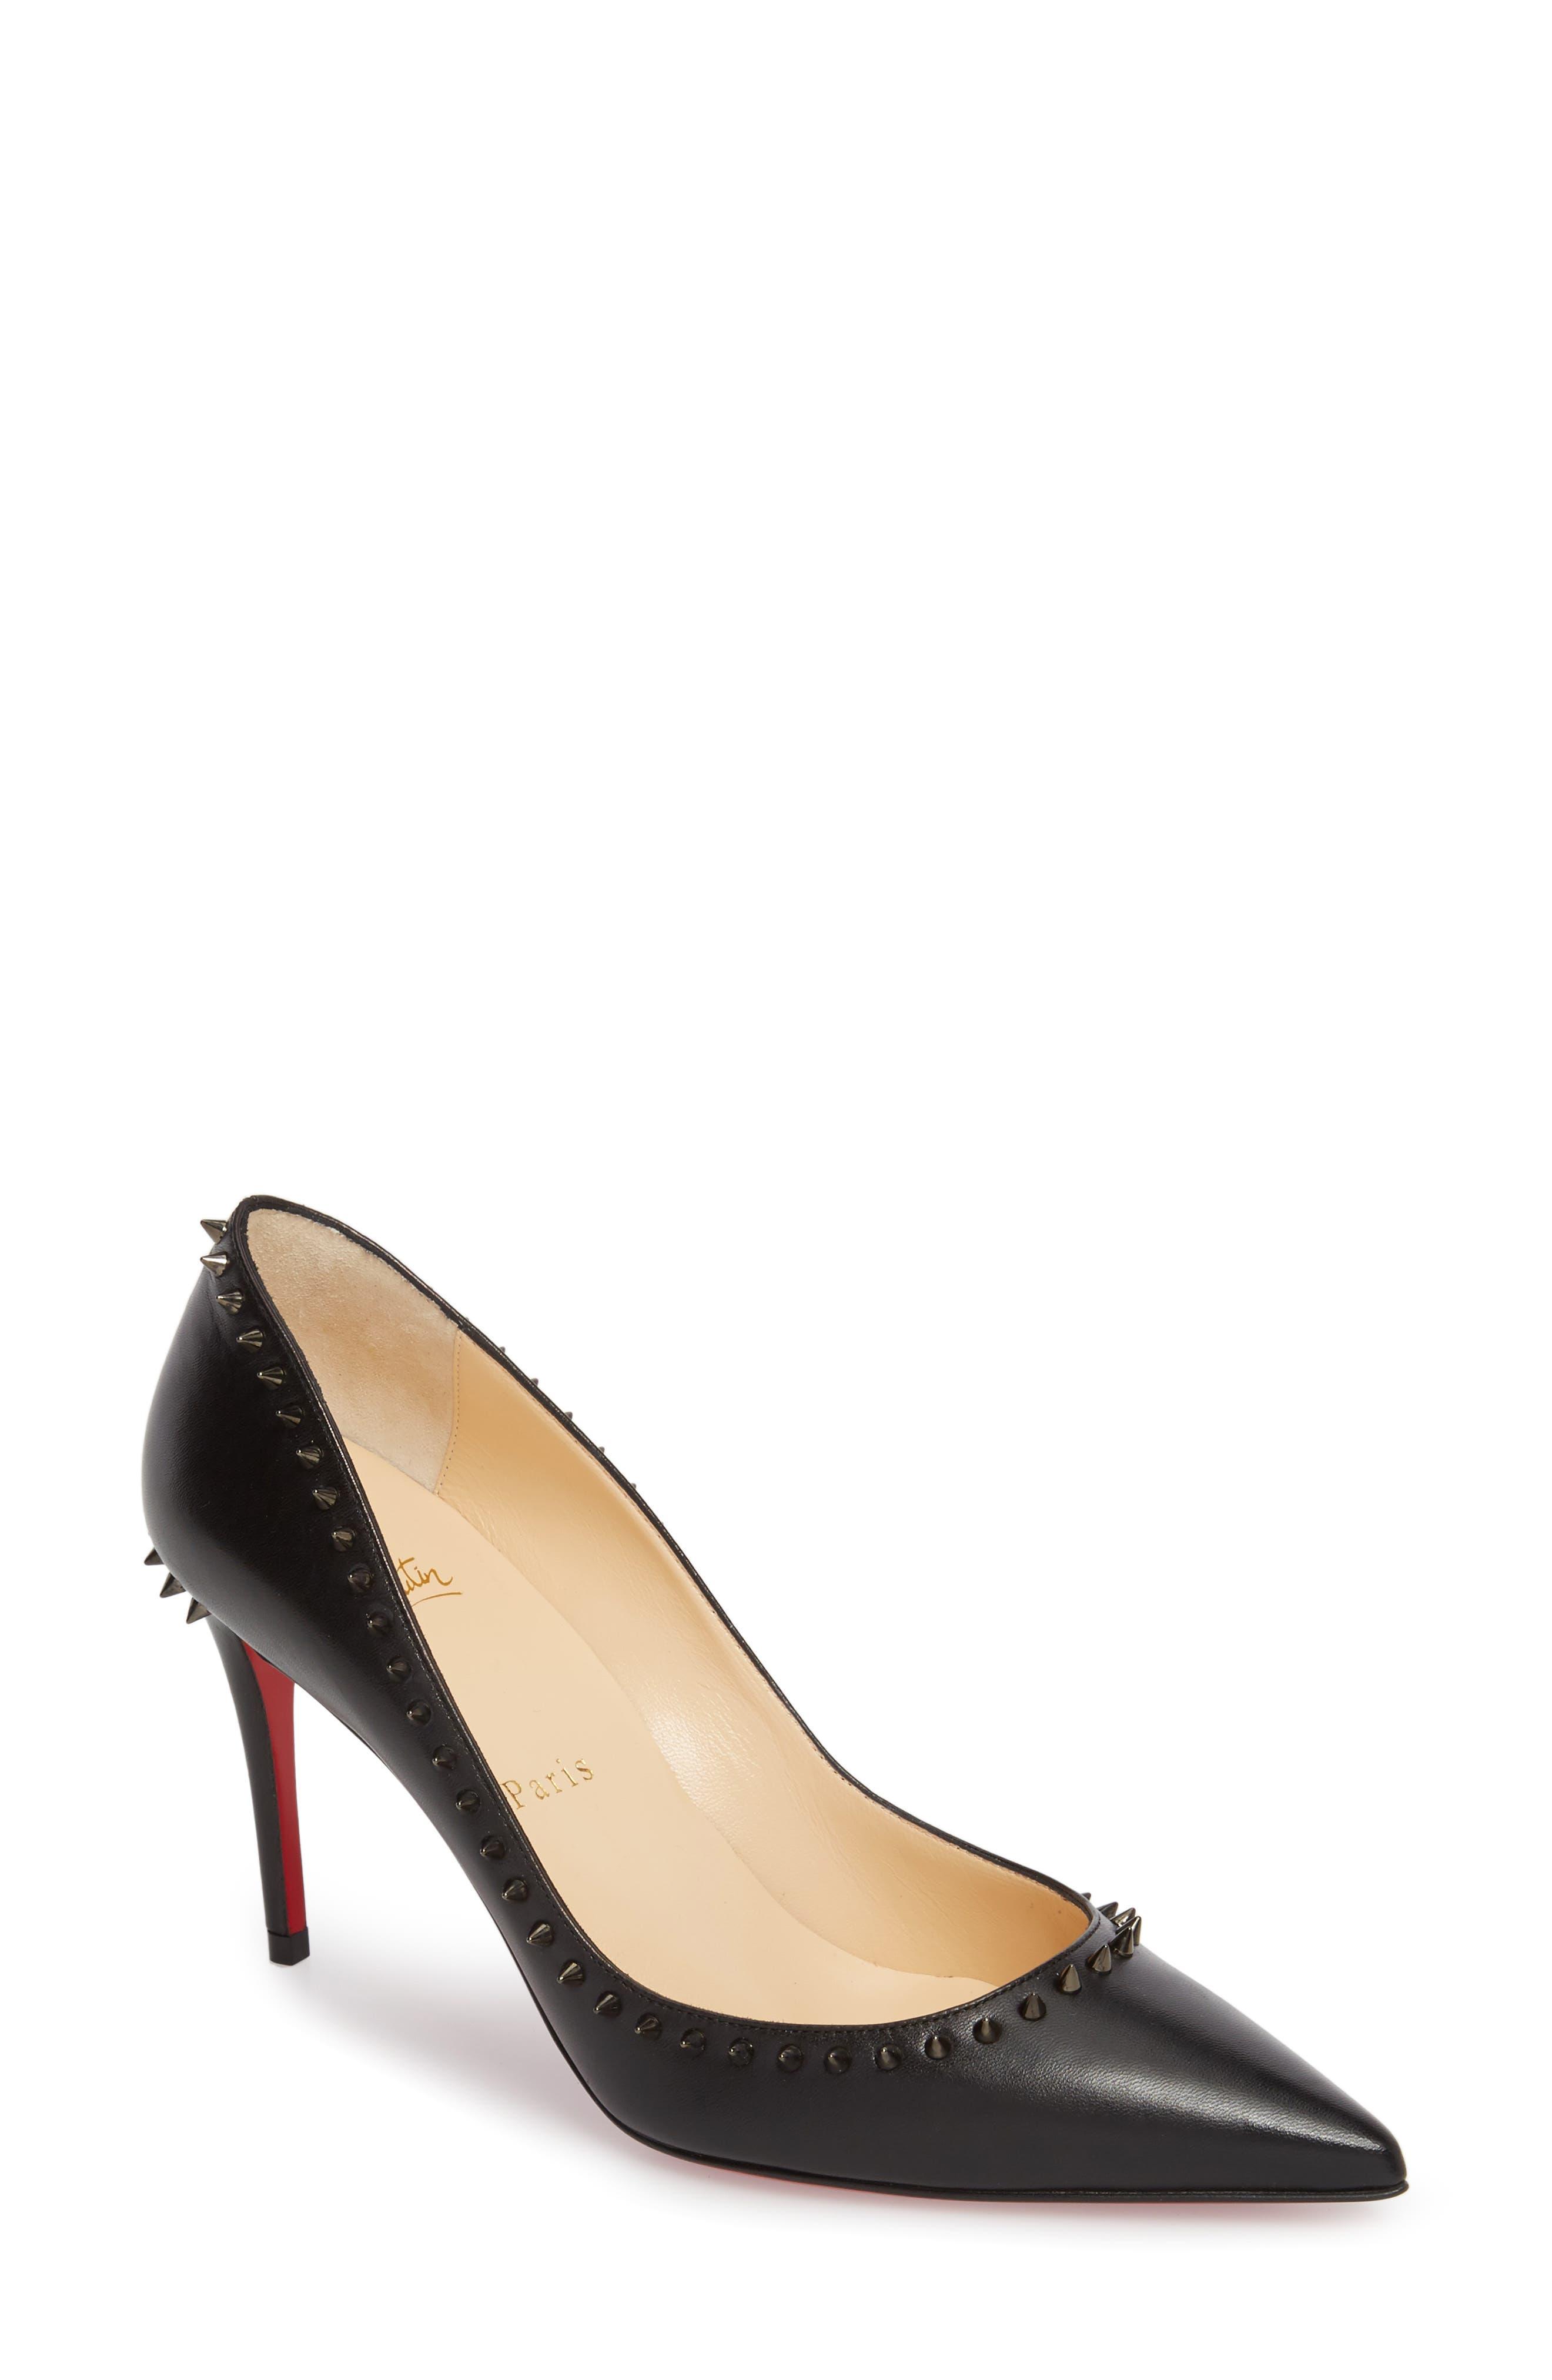 Anjalina Spiked Pointy Toe Pump,                         Main,                         color, Black